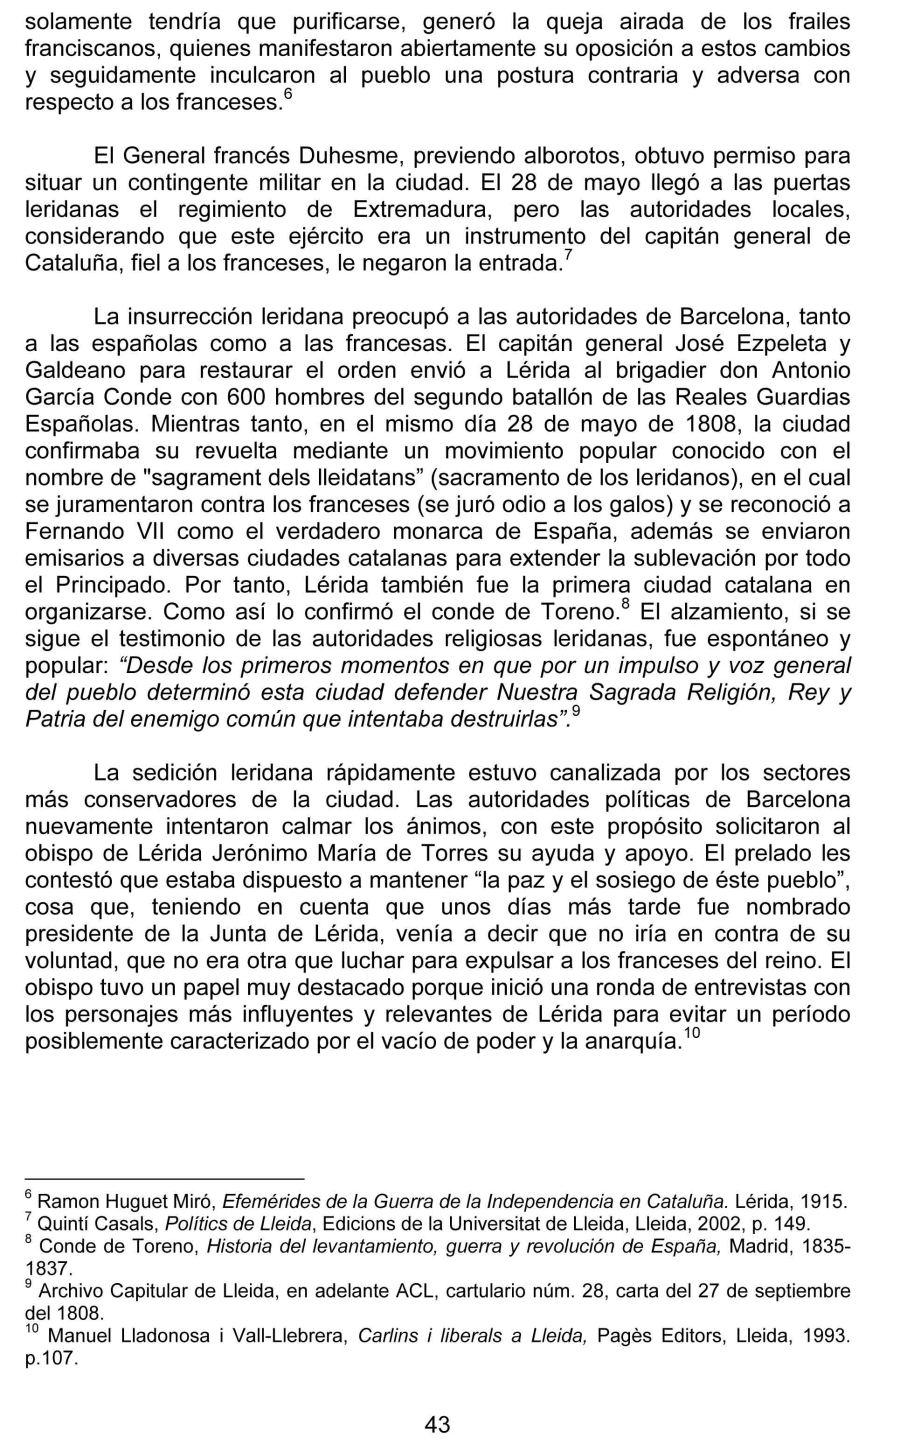 Microsoft Word - 02_Sánchez Antoni_Art.doc